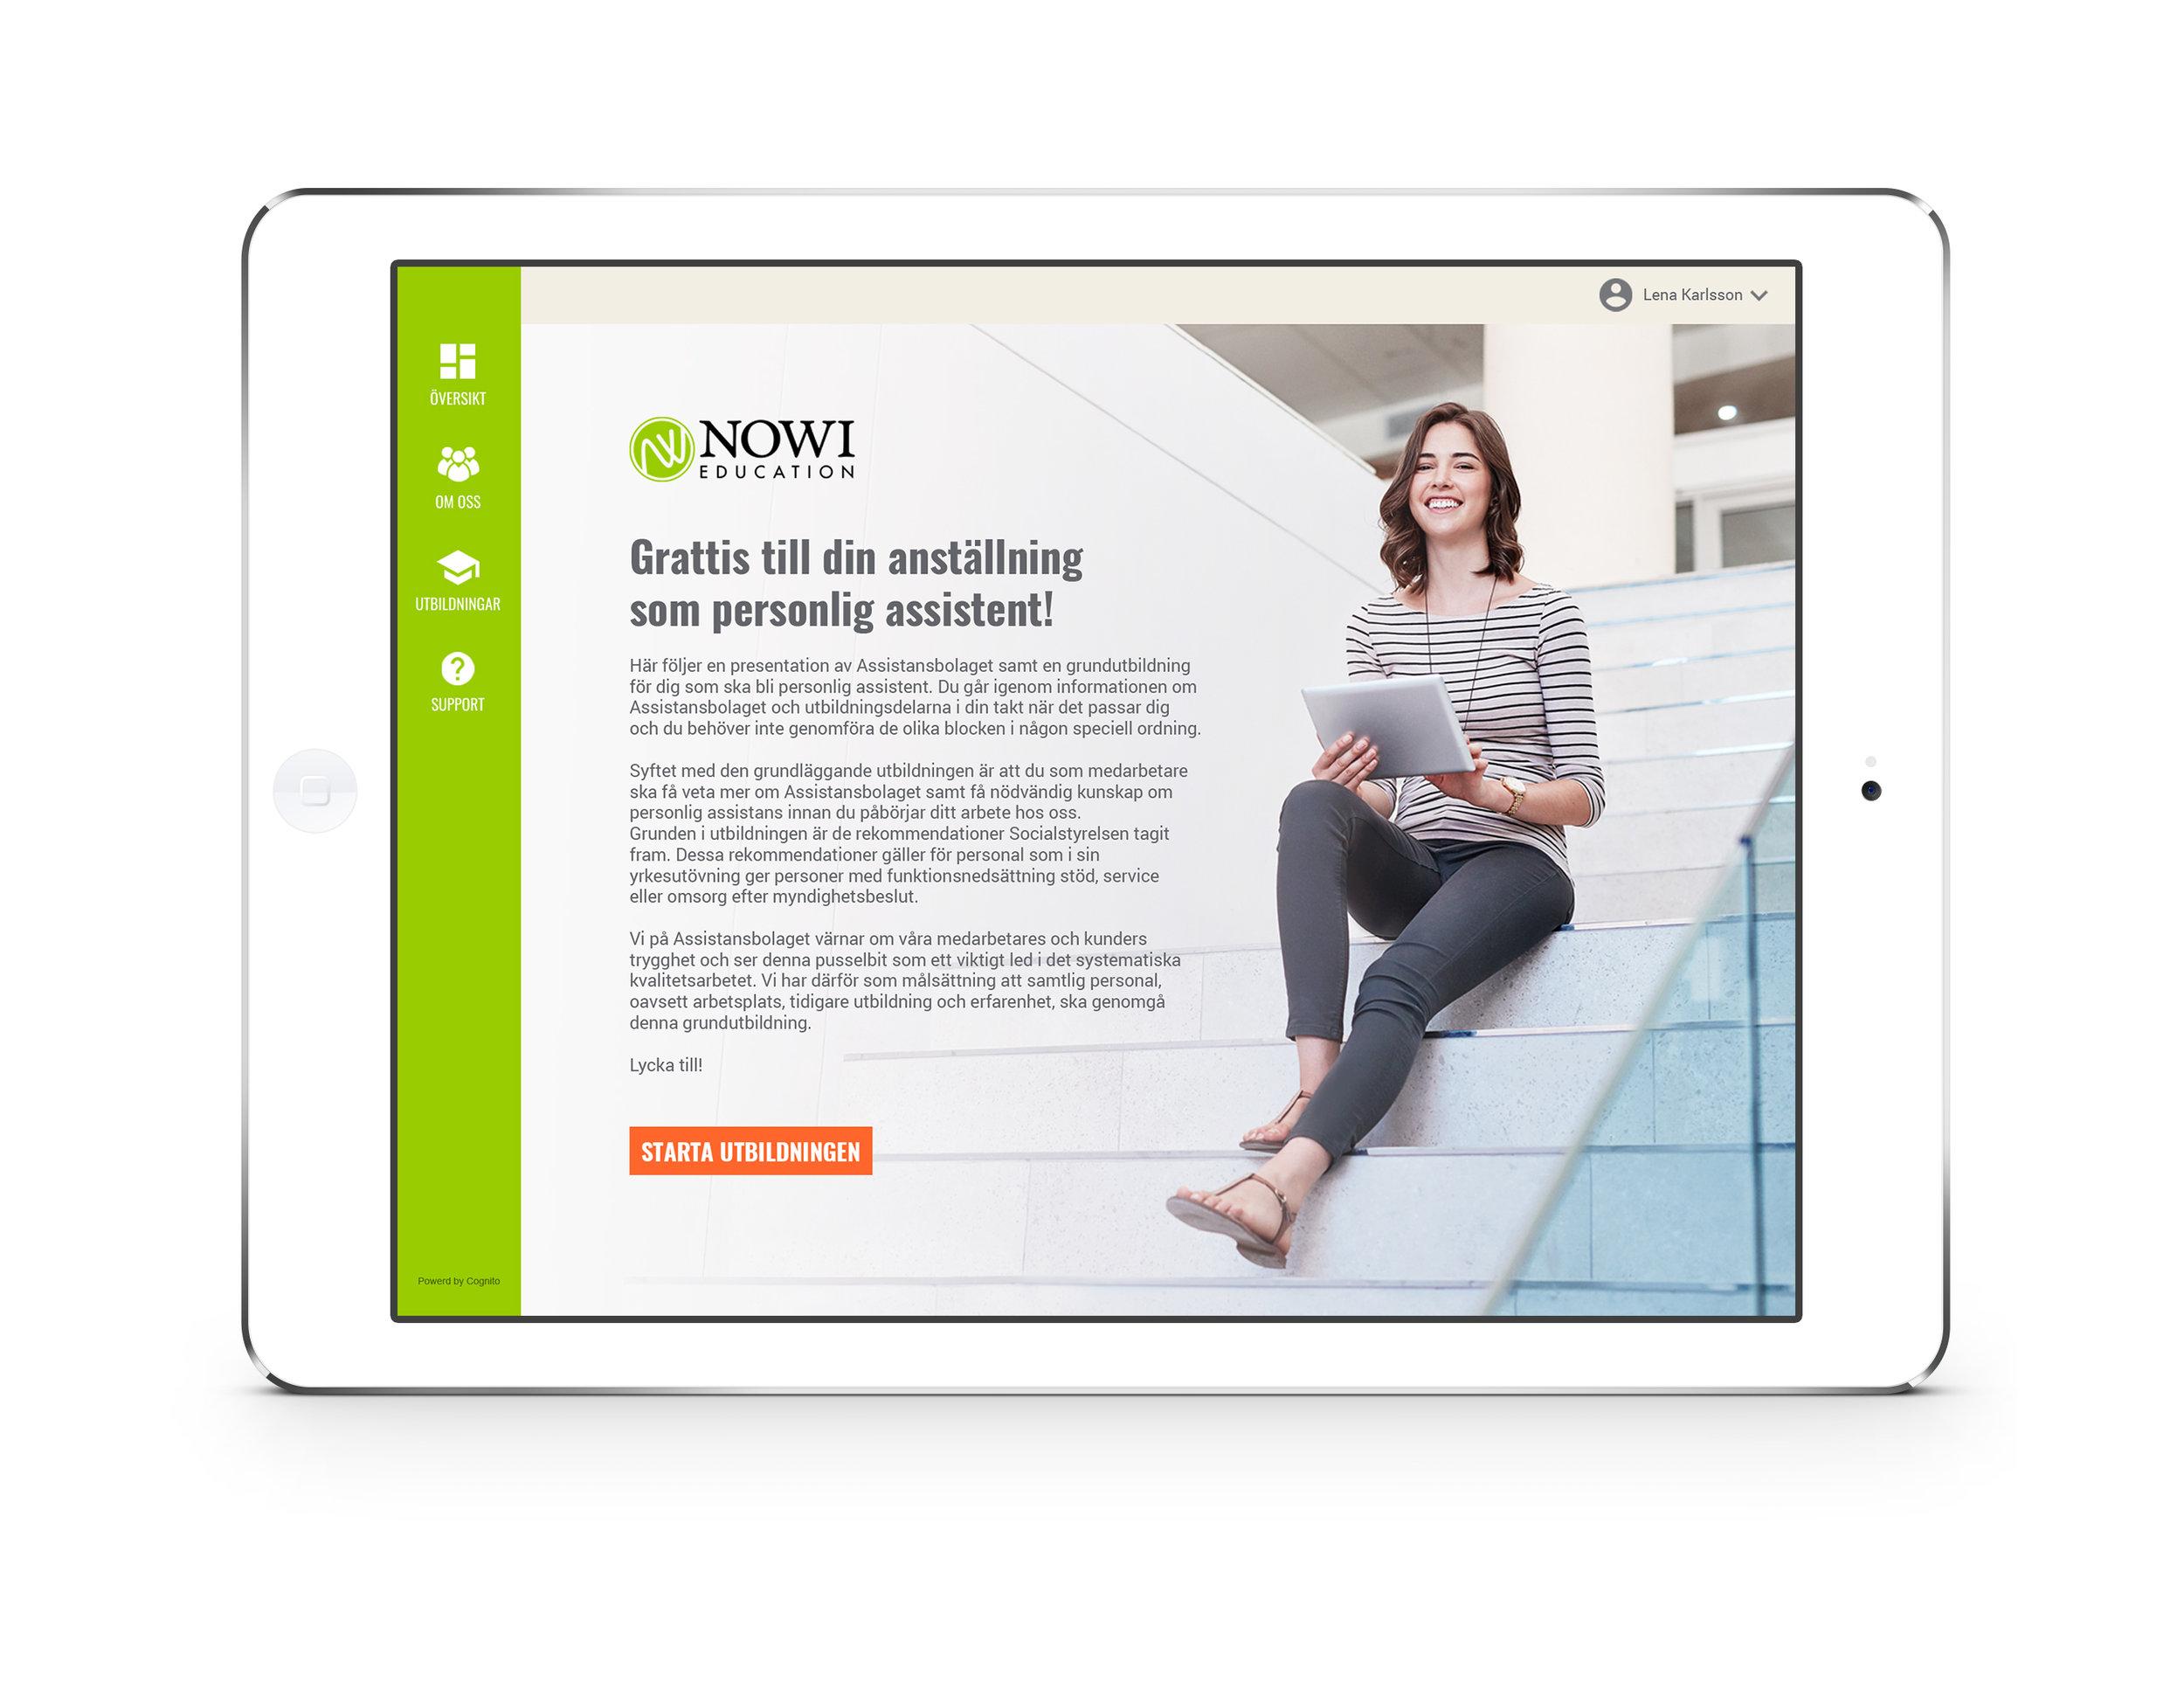 iPad-Air-Landscape-Mock-up_1.jpg